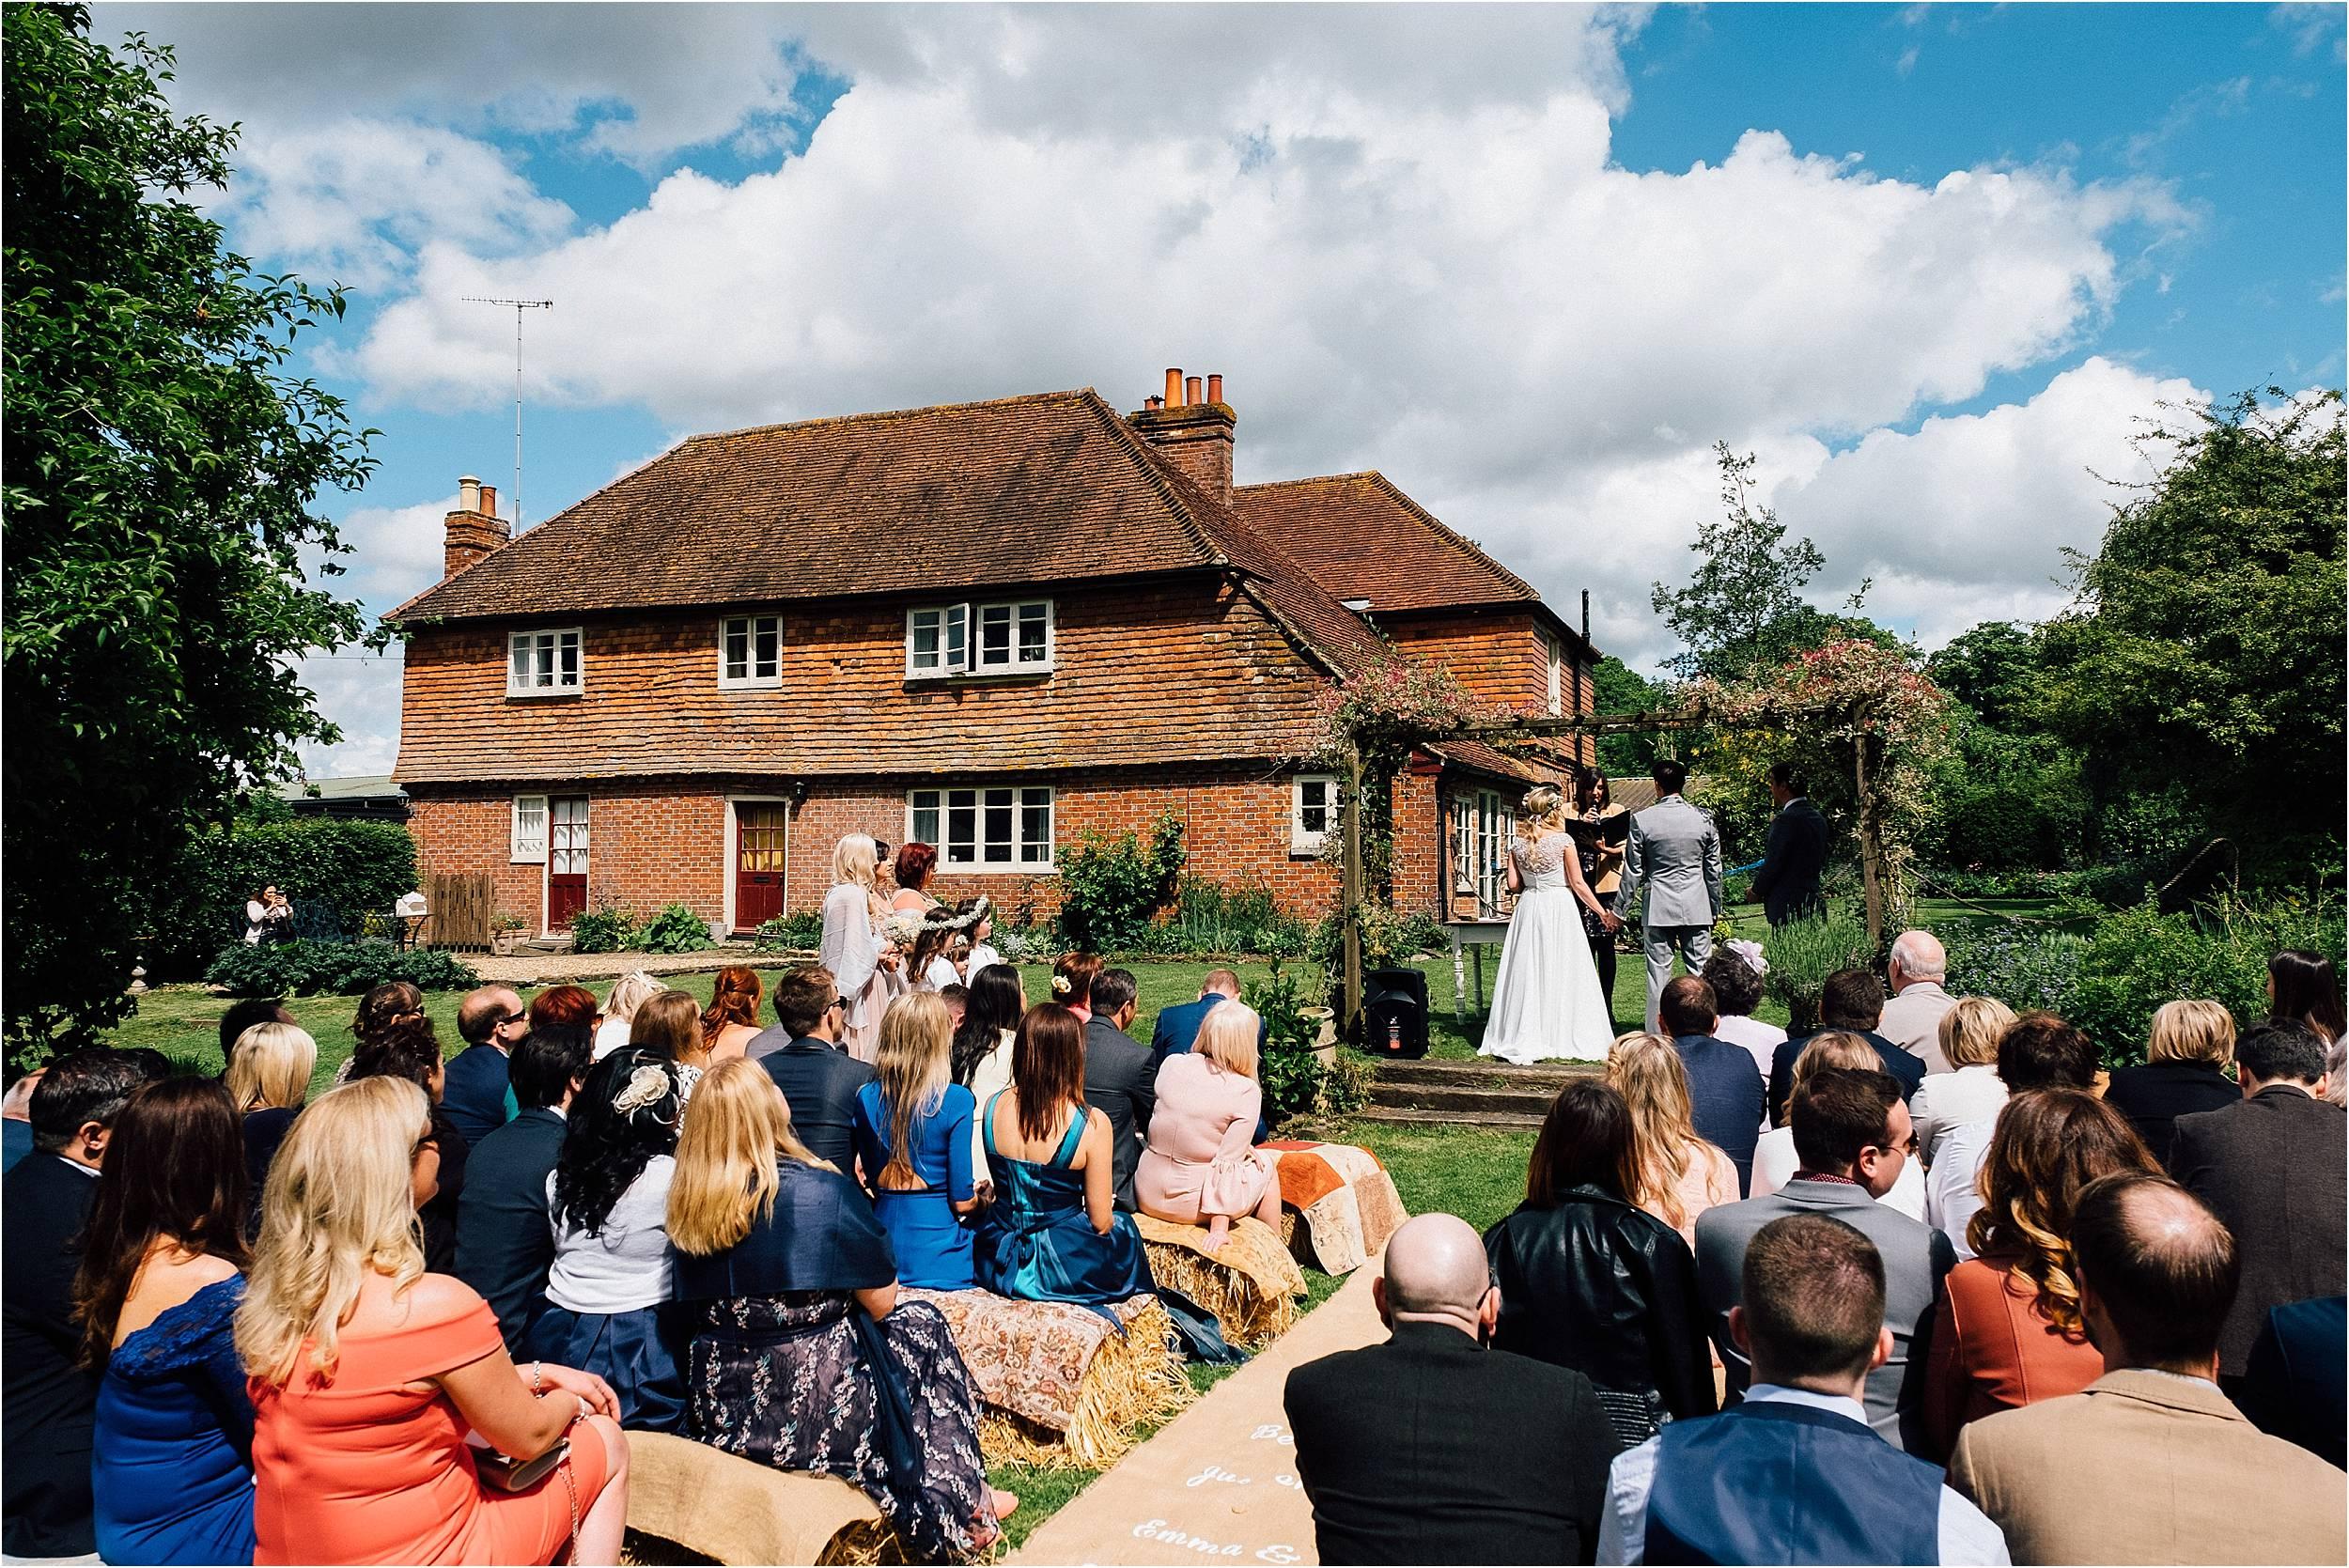 Surrey Hookhouse Farm Wedding Photographer_0054.jpg